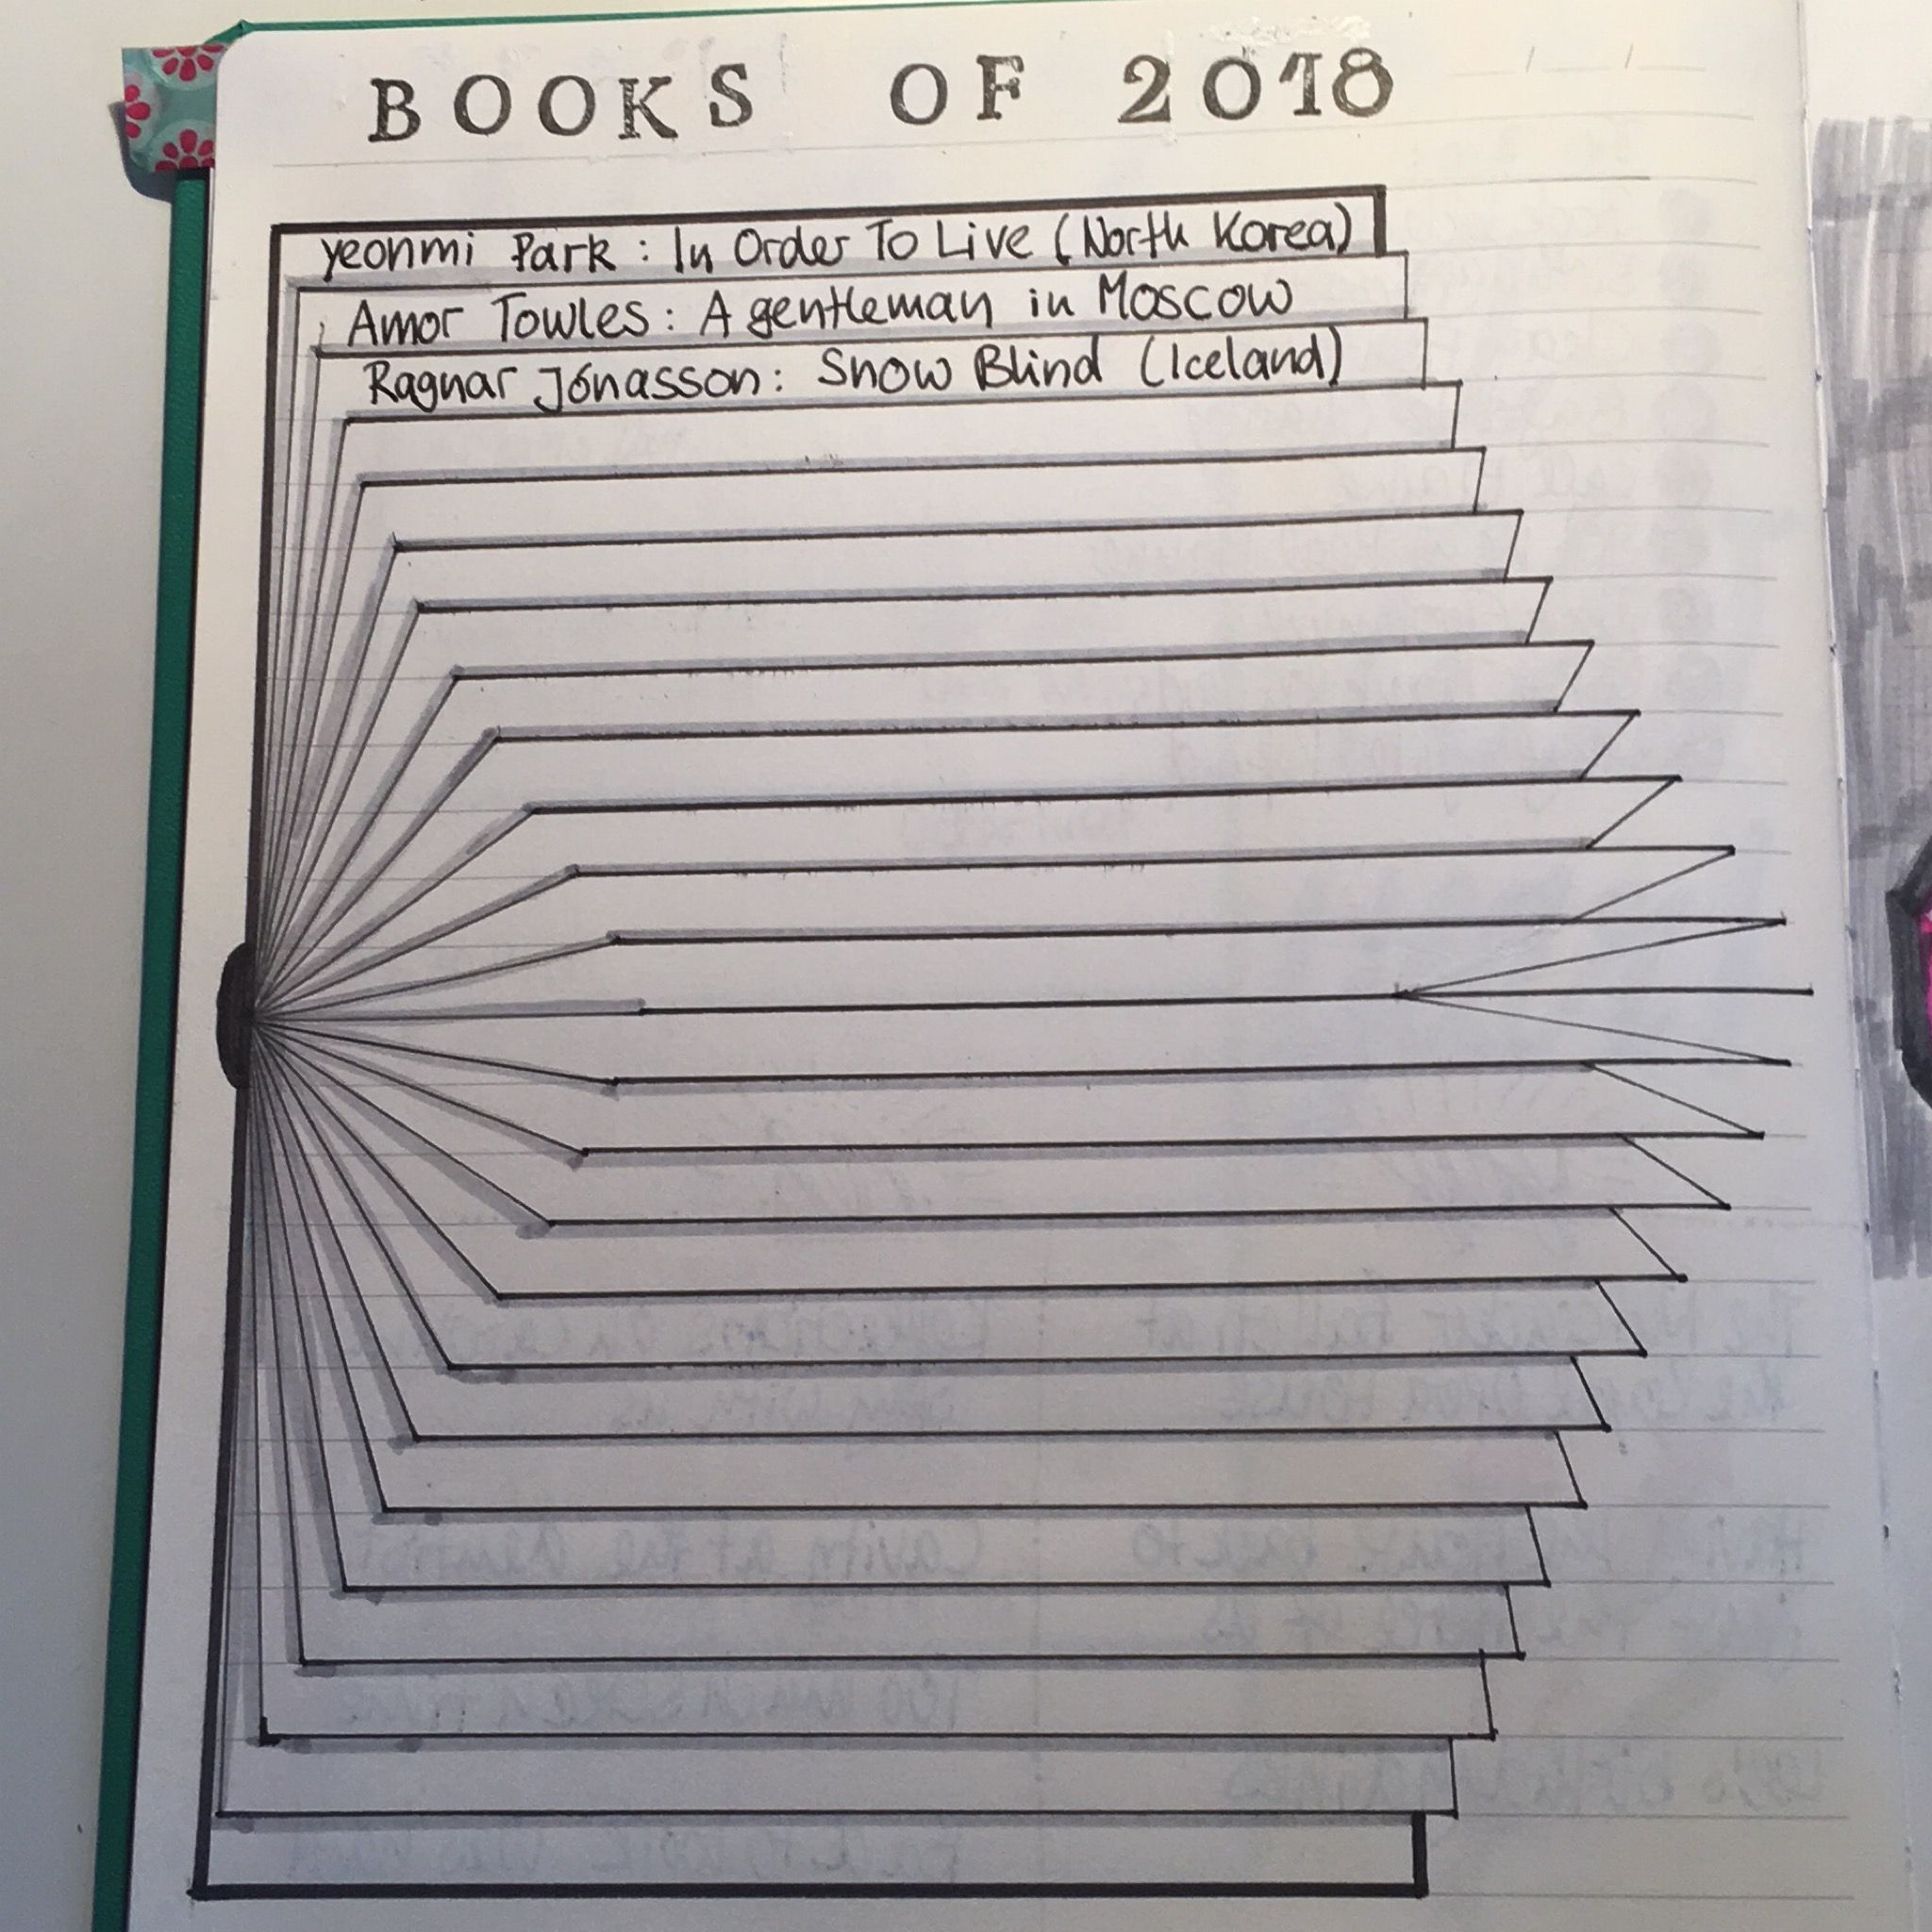 Book List Bulletjournal Diaryideas Bullet Journal Books Bullet Journal Ideas Pages Bullet Journal Inspiration